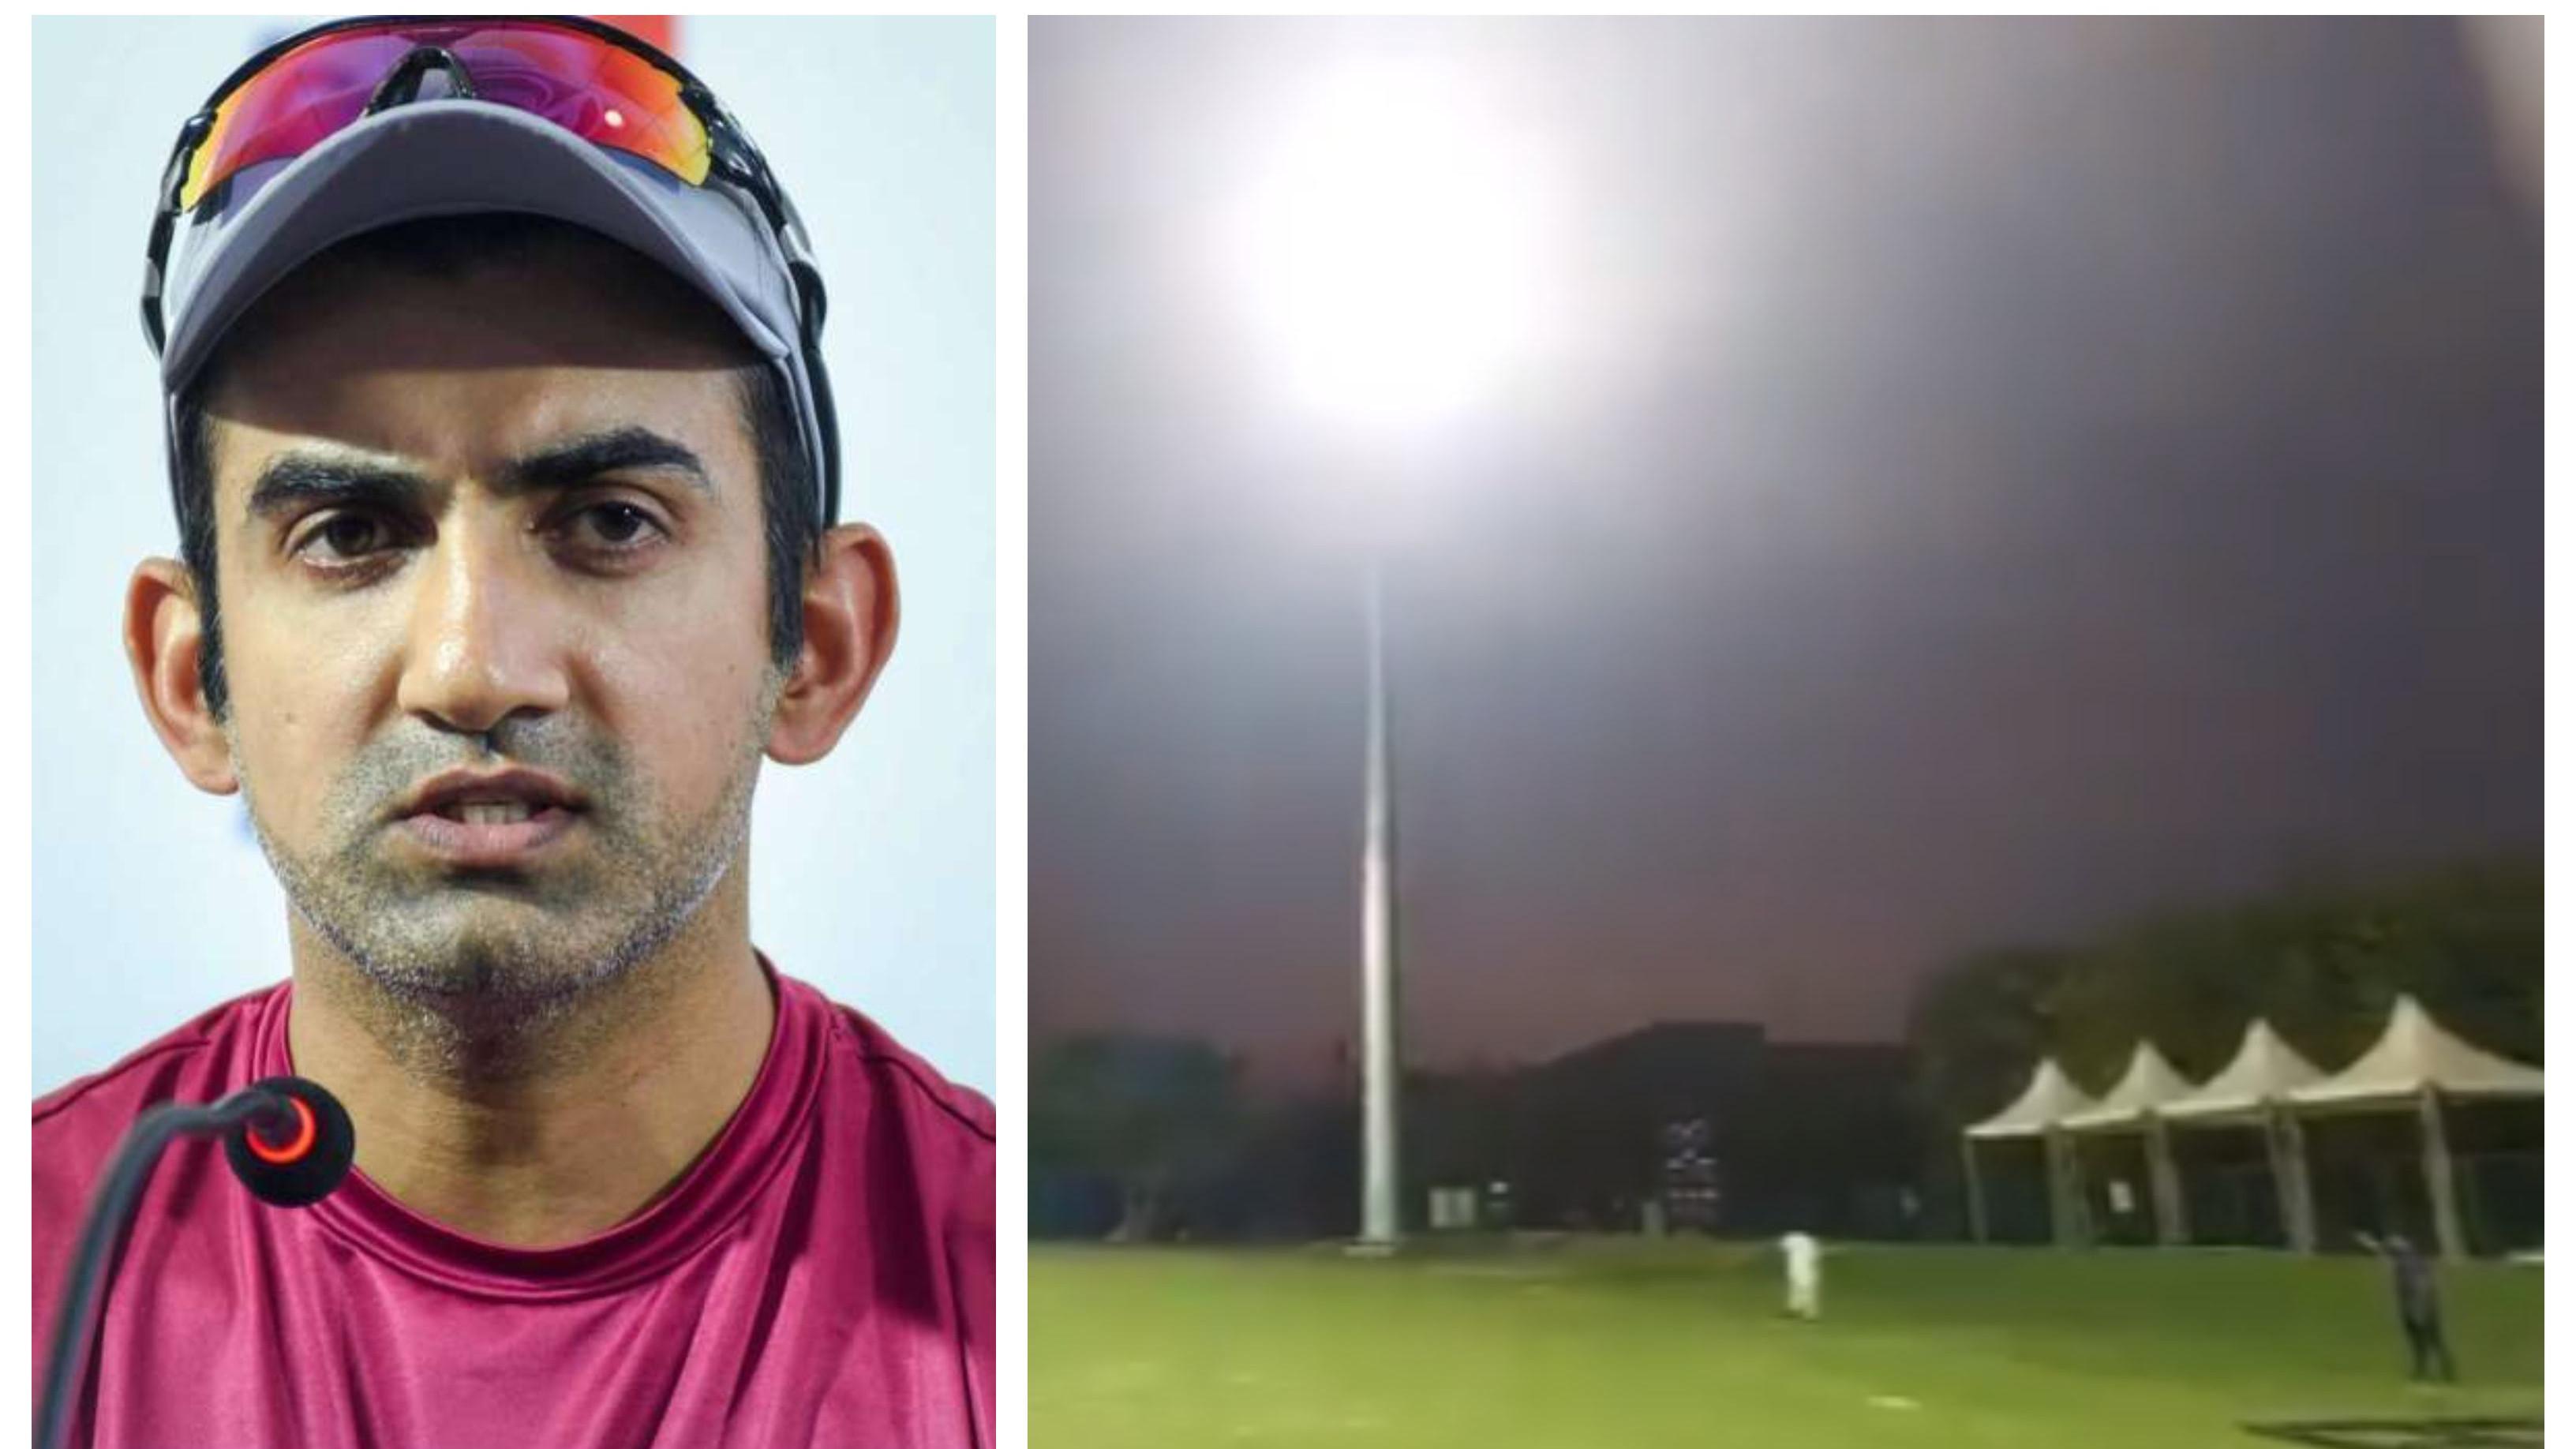 Gautam Gambhir clarifies Yamuna Sports Complex not converted to cricket field, only upgraded